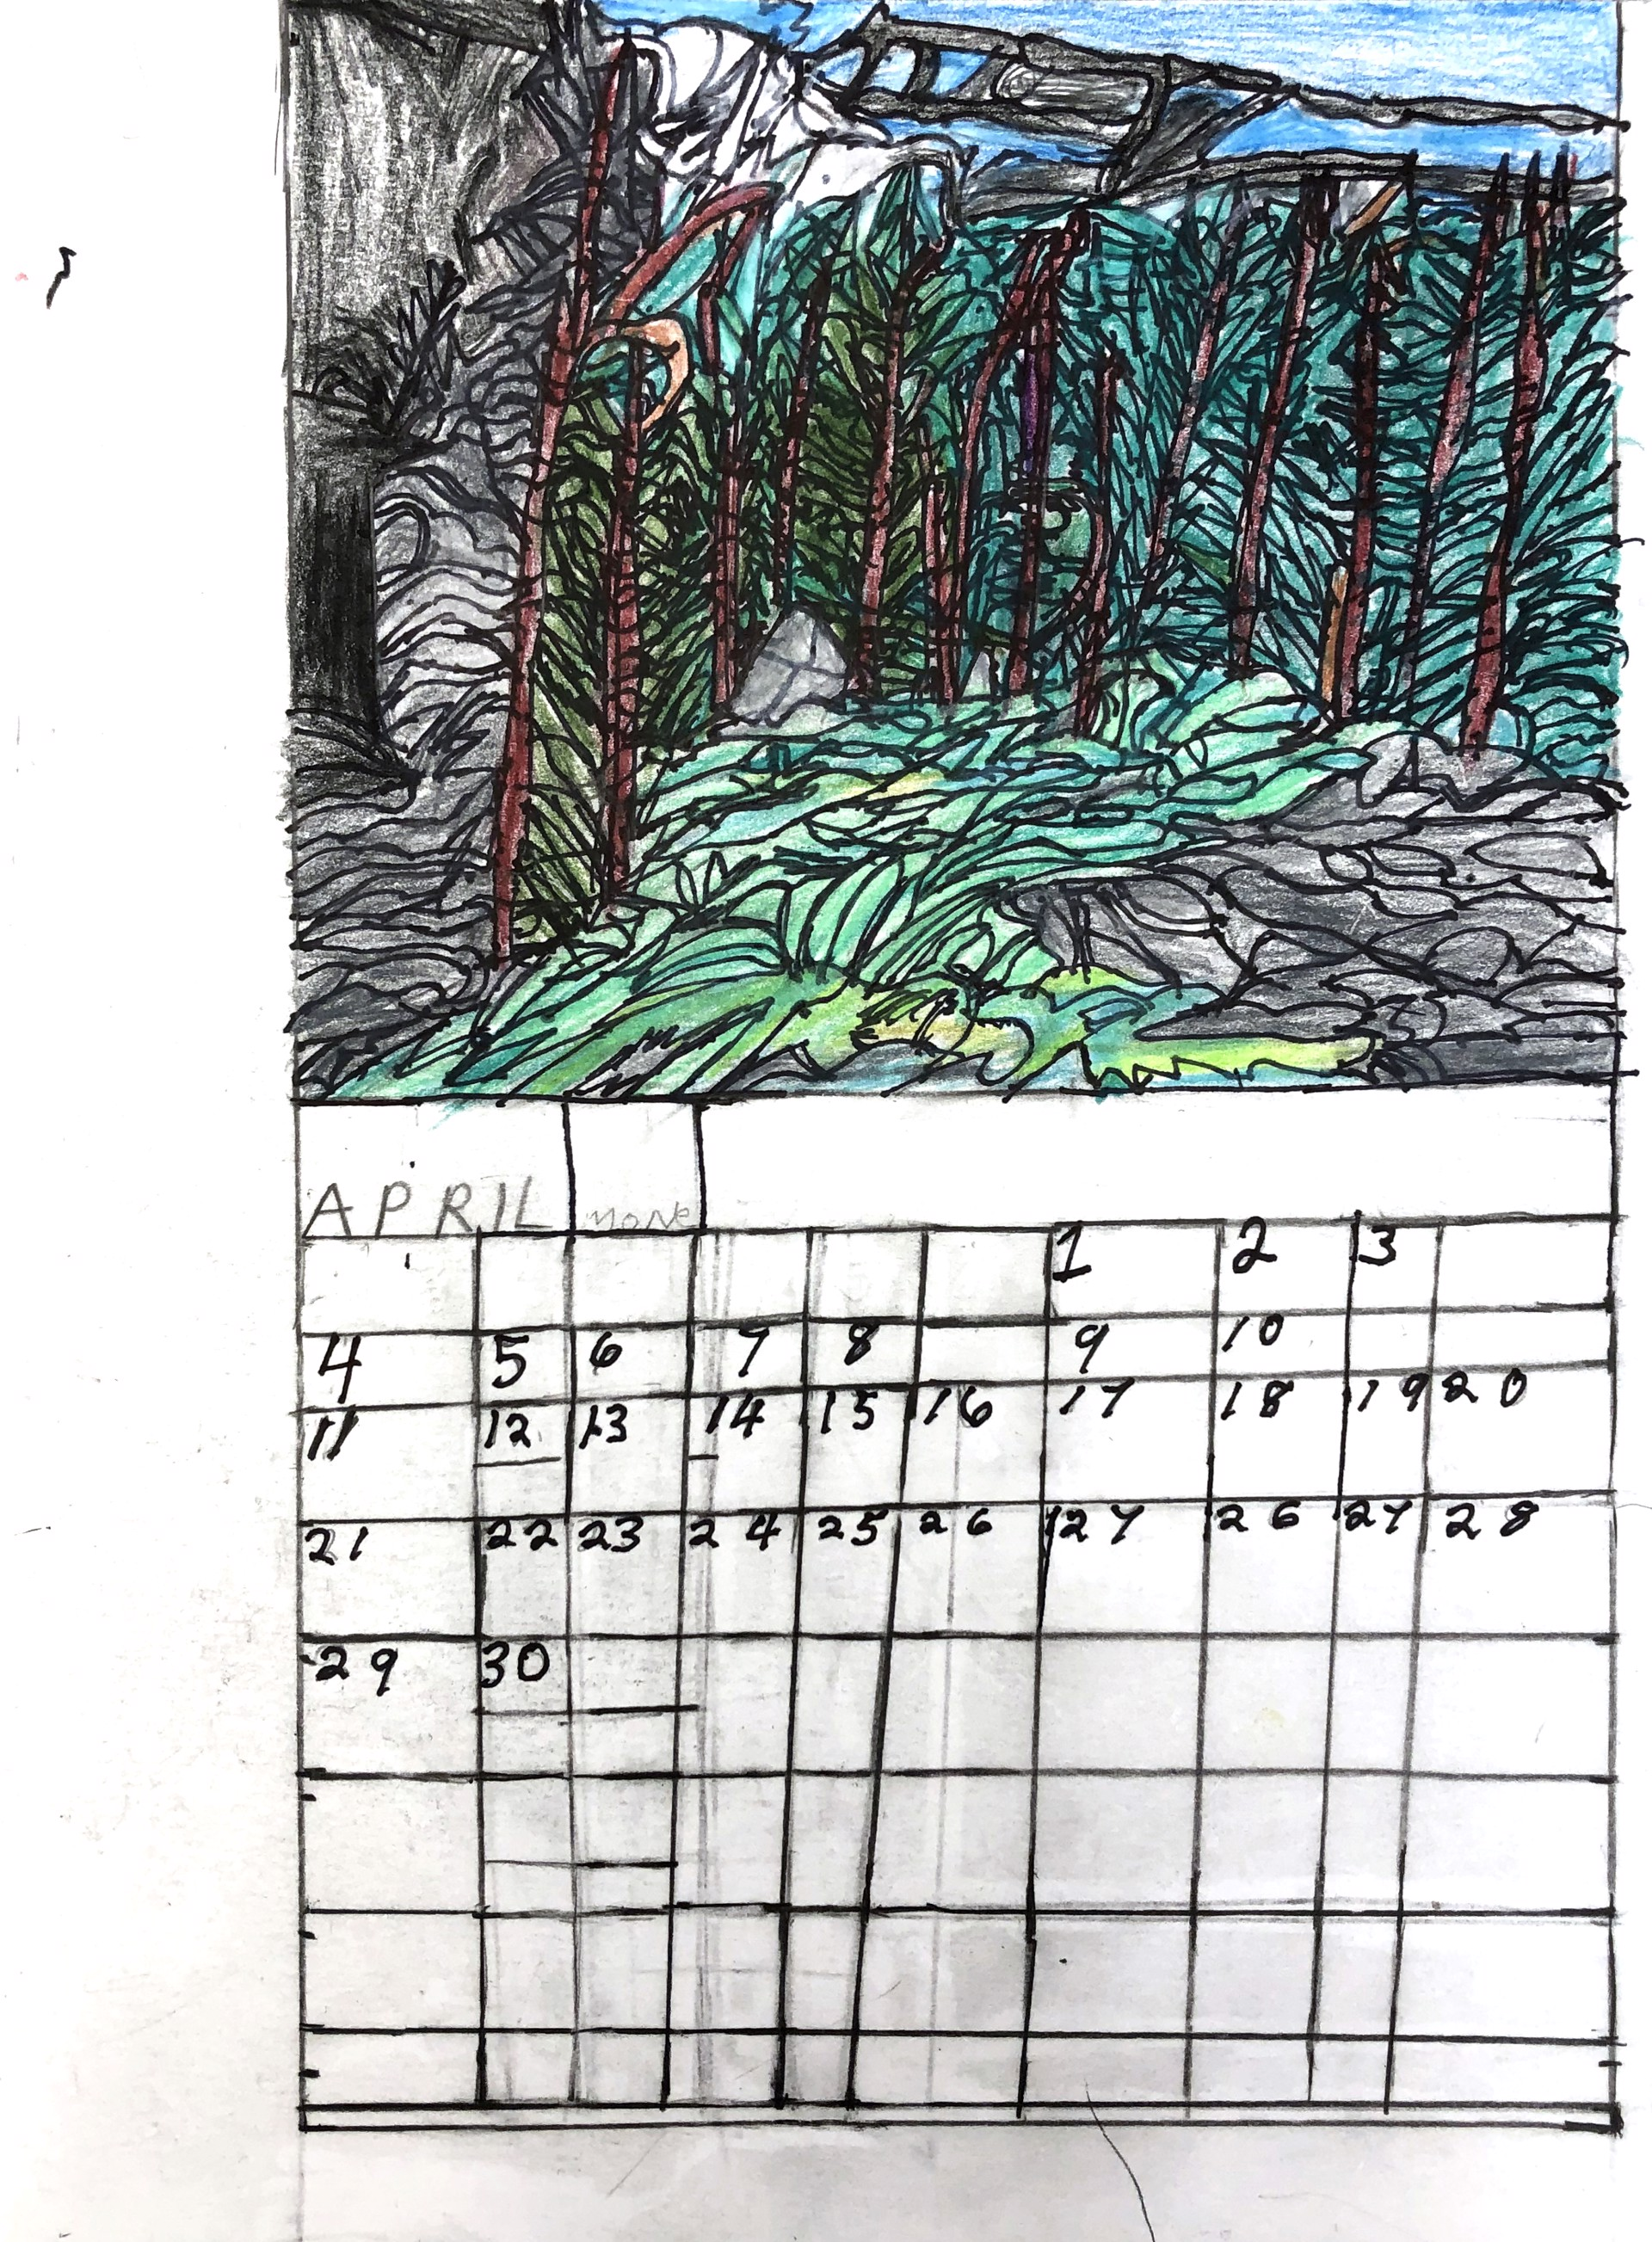 Calendar by Raymond Lewis